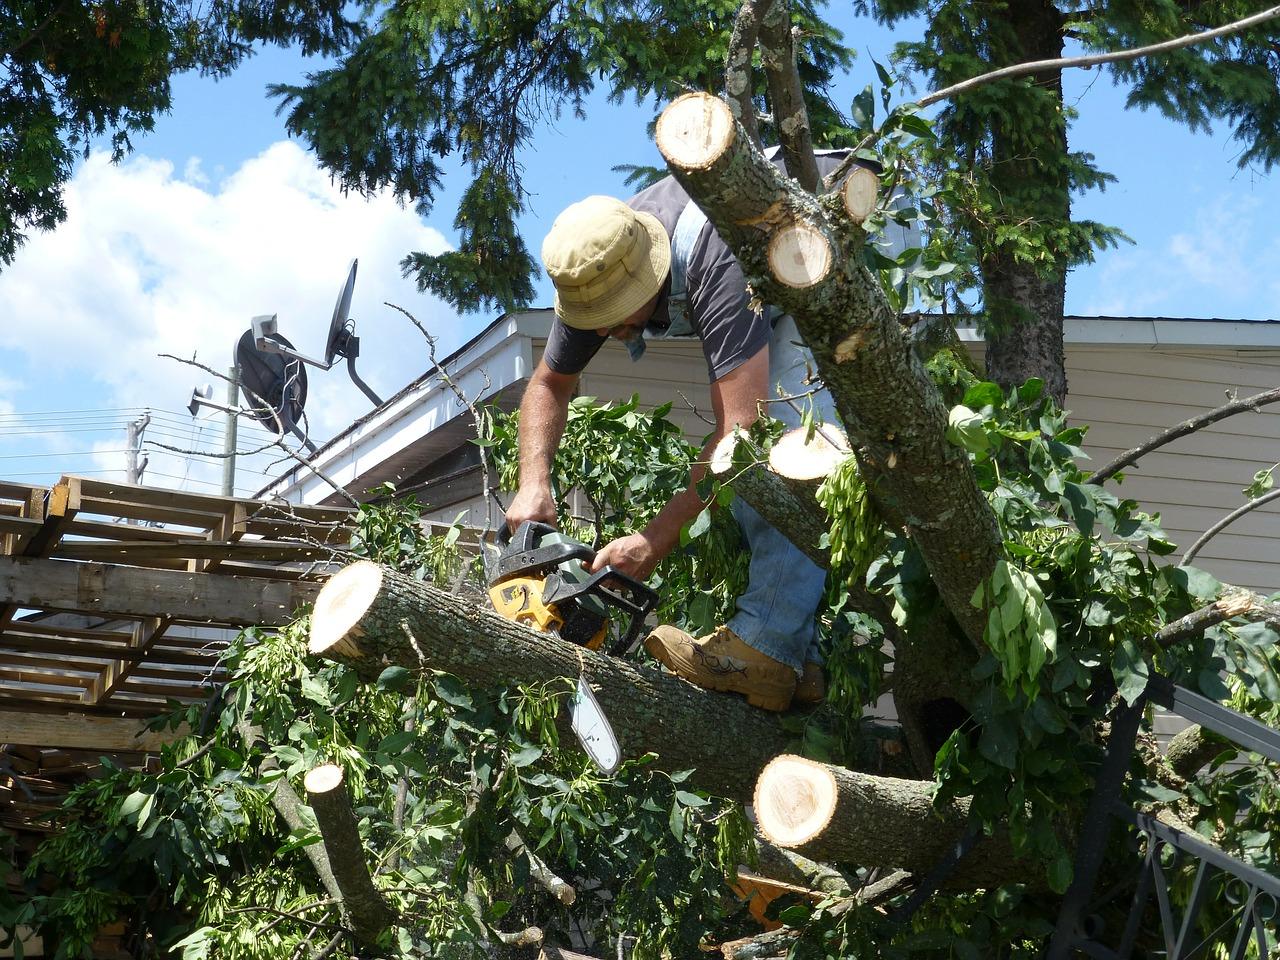 Fallen tree 2015 richard montgomery spiritdancerdesigns Image collections